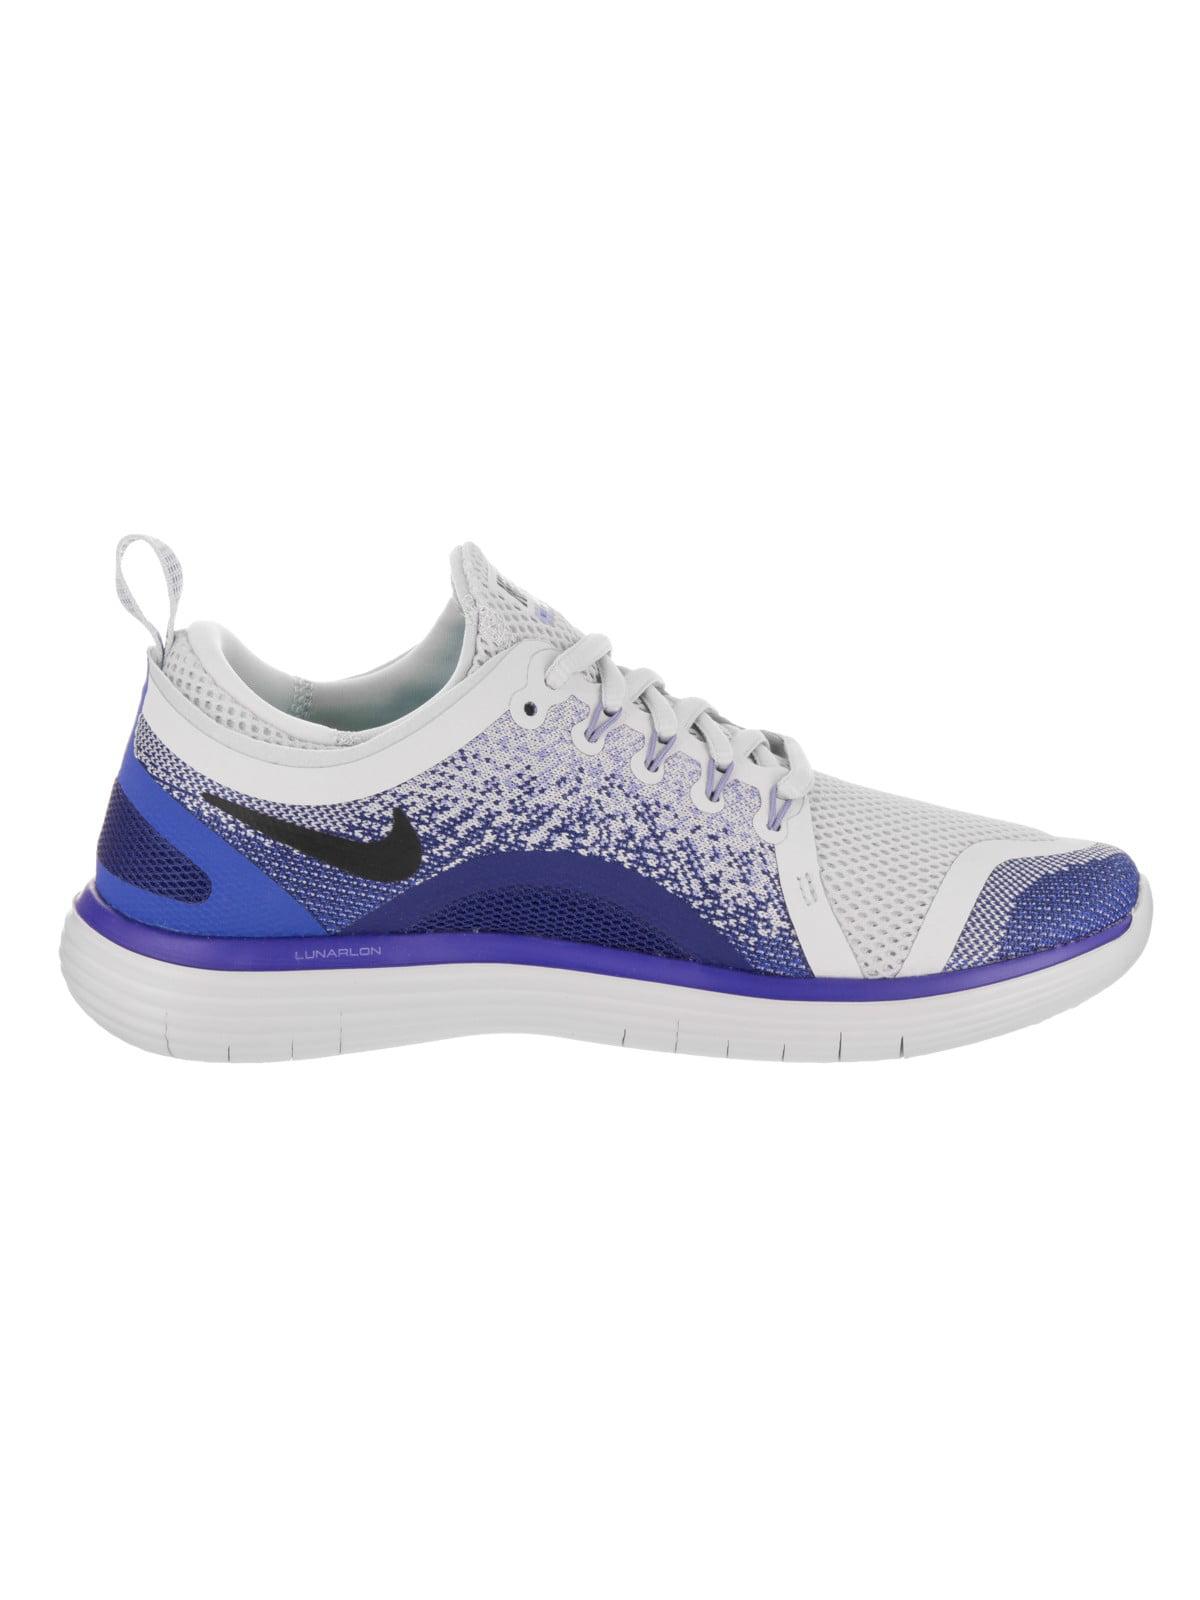 Men's/Women's: Distance Nike Women's Free Rn Distance Men's/Women's: 2 Running Shoe: Multiple new designs e848d8